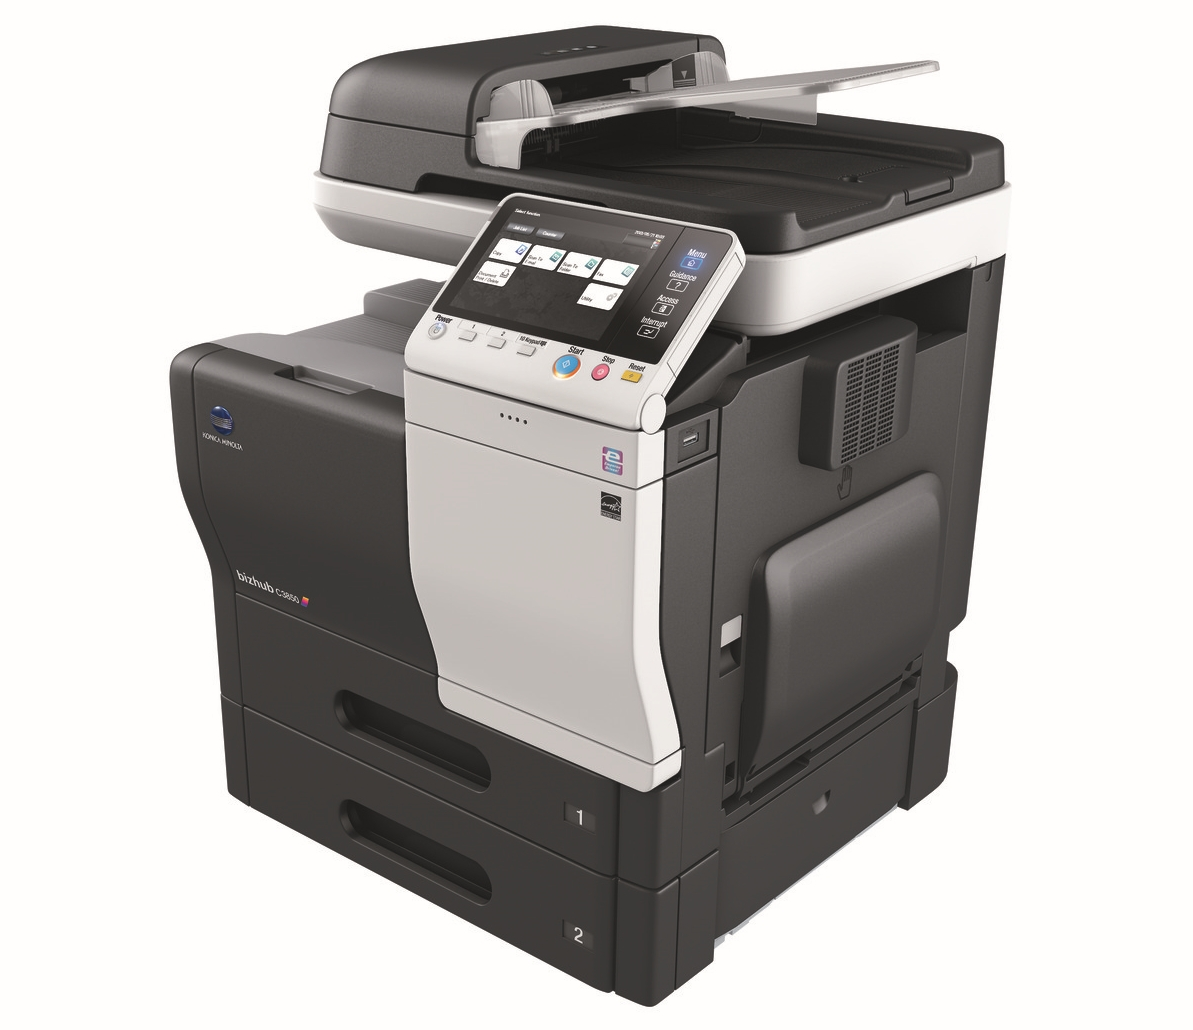 Konica Minolta Bizhub C284e Colour Copier/Printer/Scanner